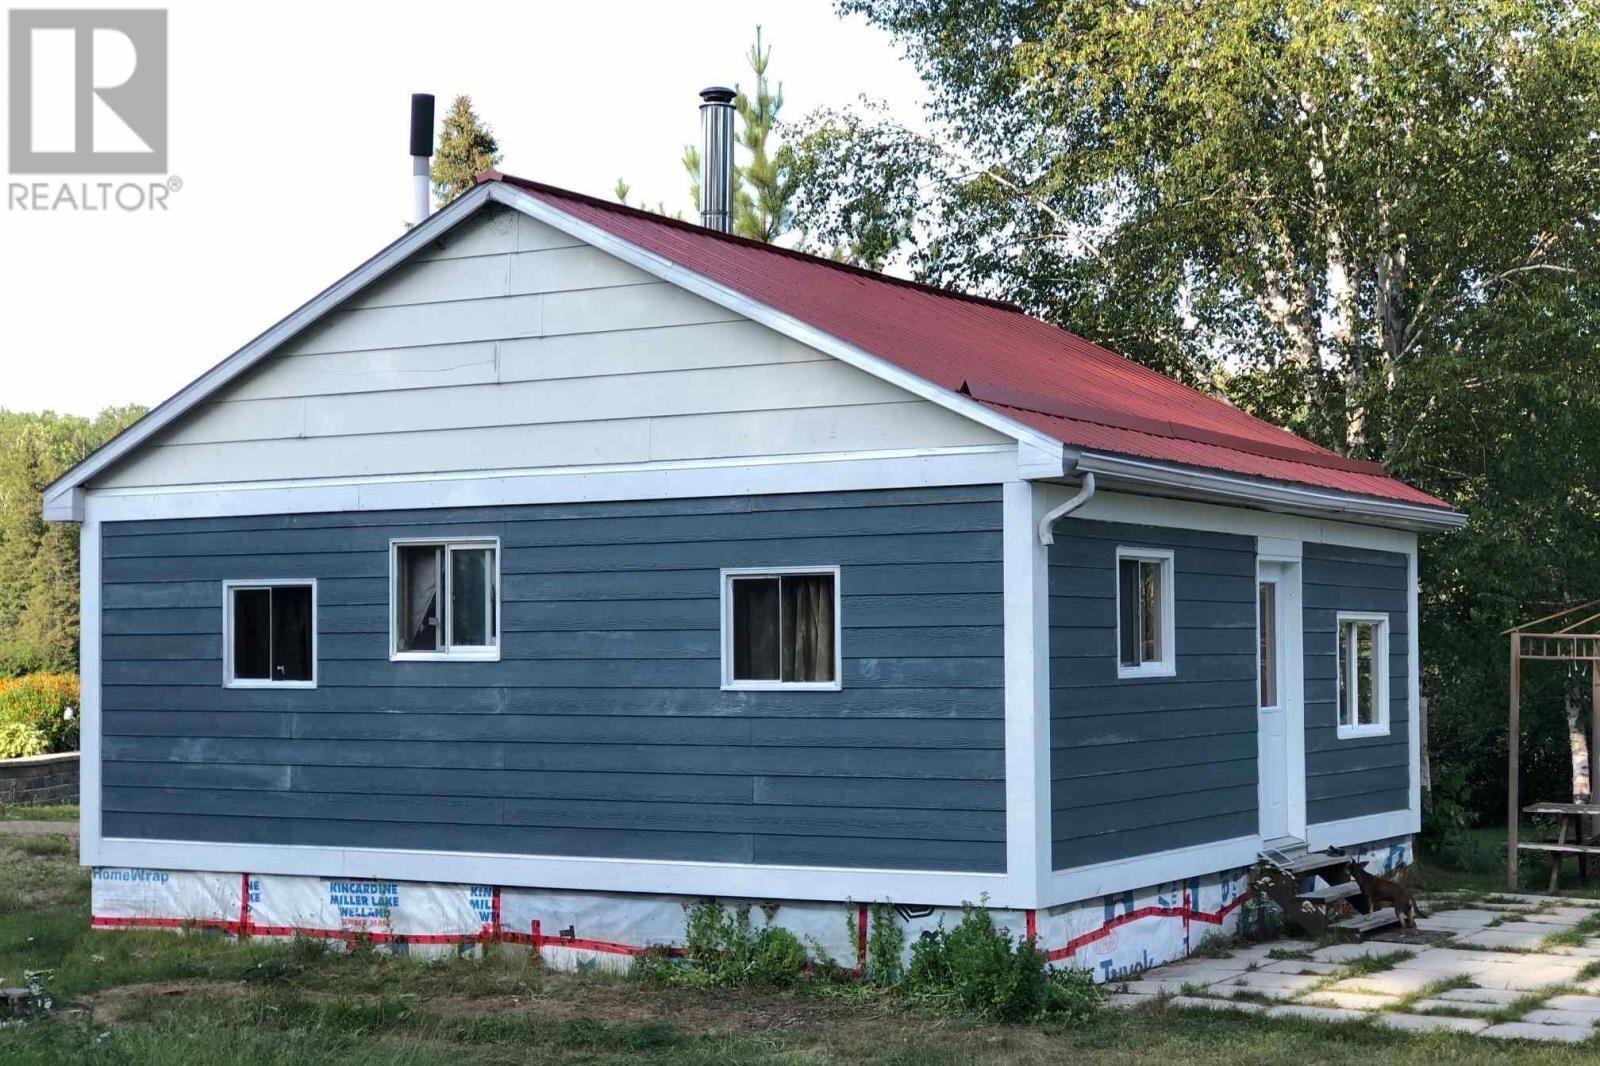 House for sale at 215077 Sharp Lake Rd Temiskaming Shores Ontario - MLS: TM202135